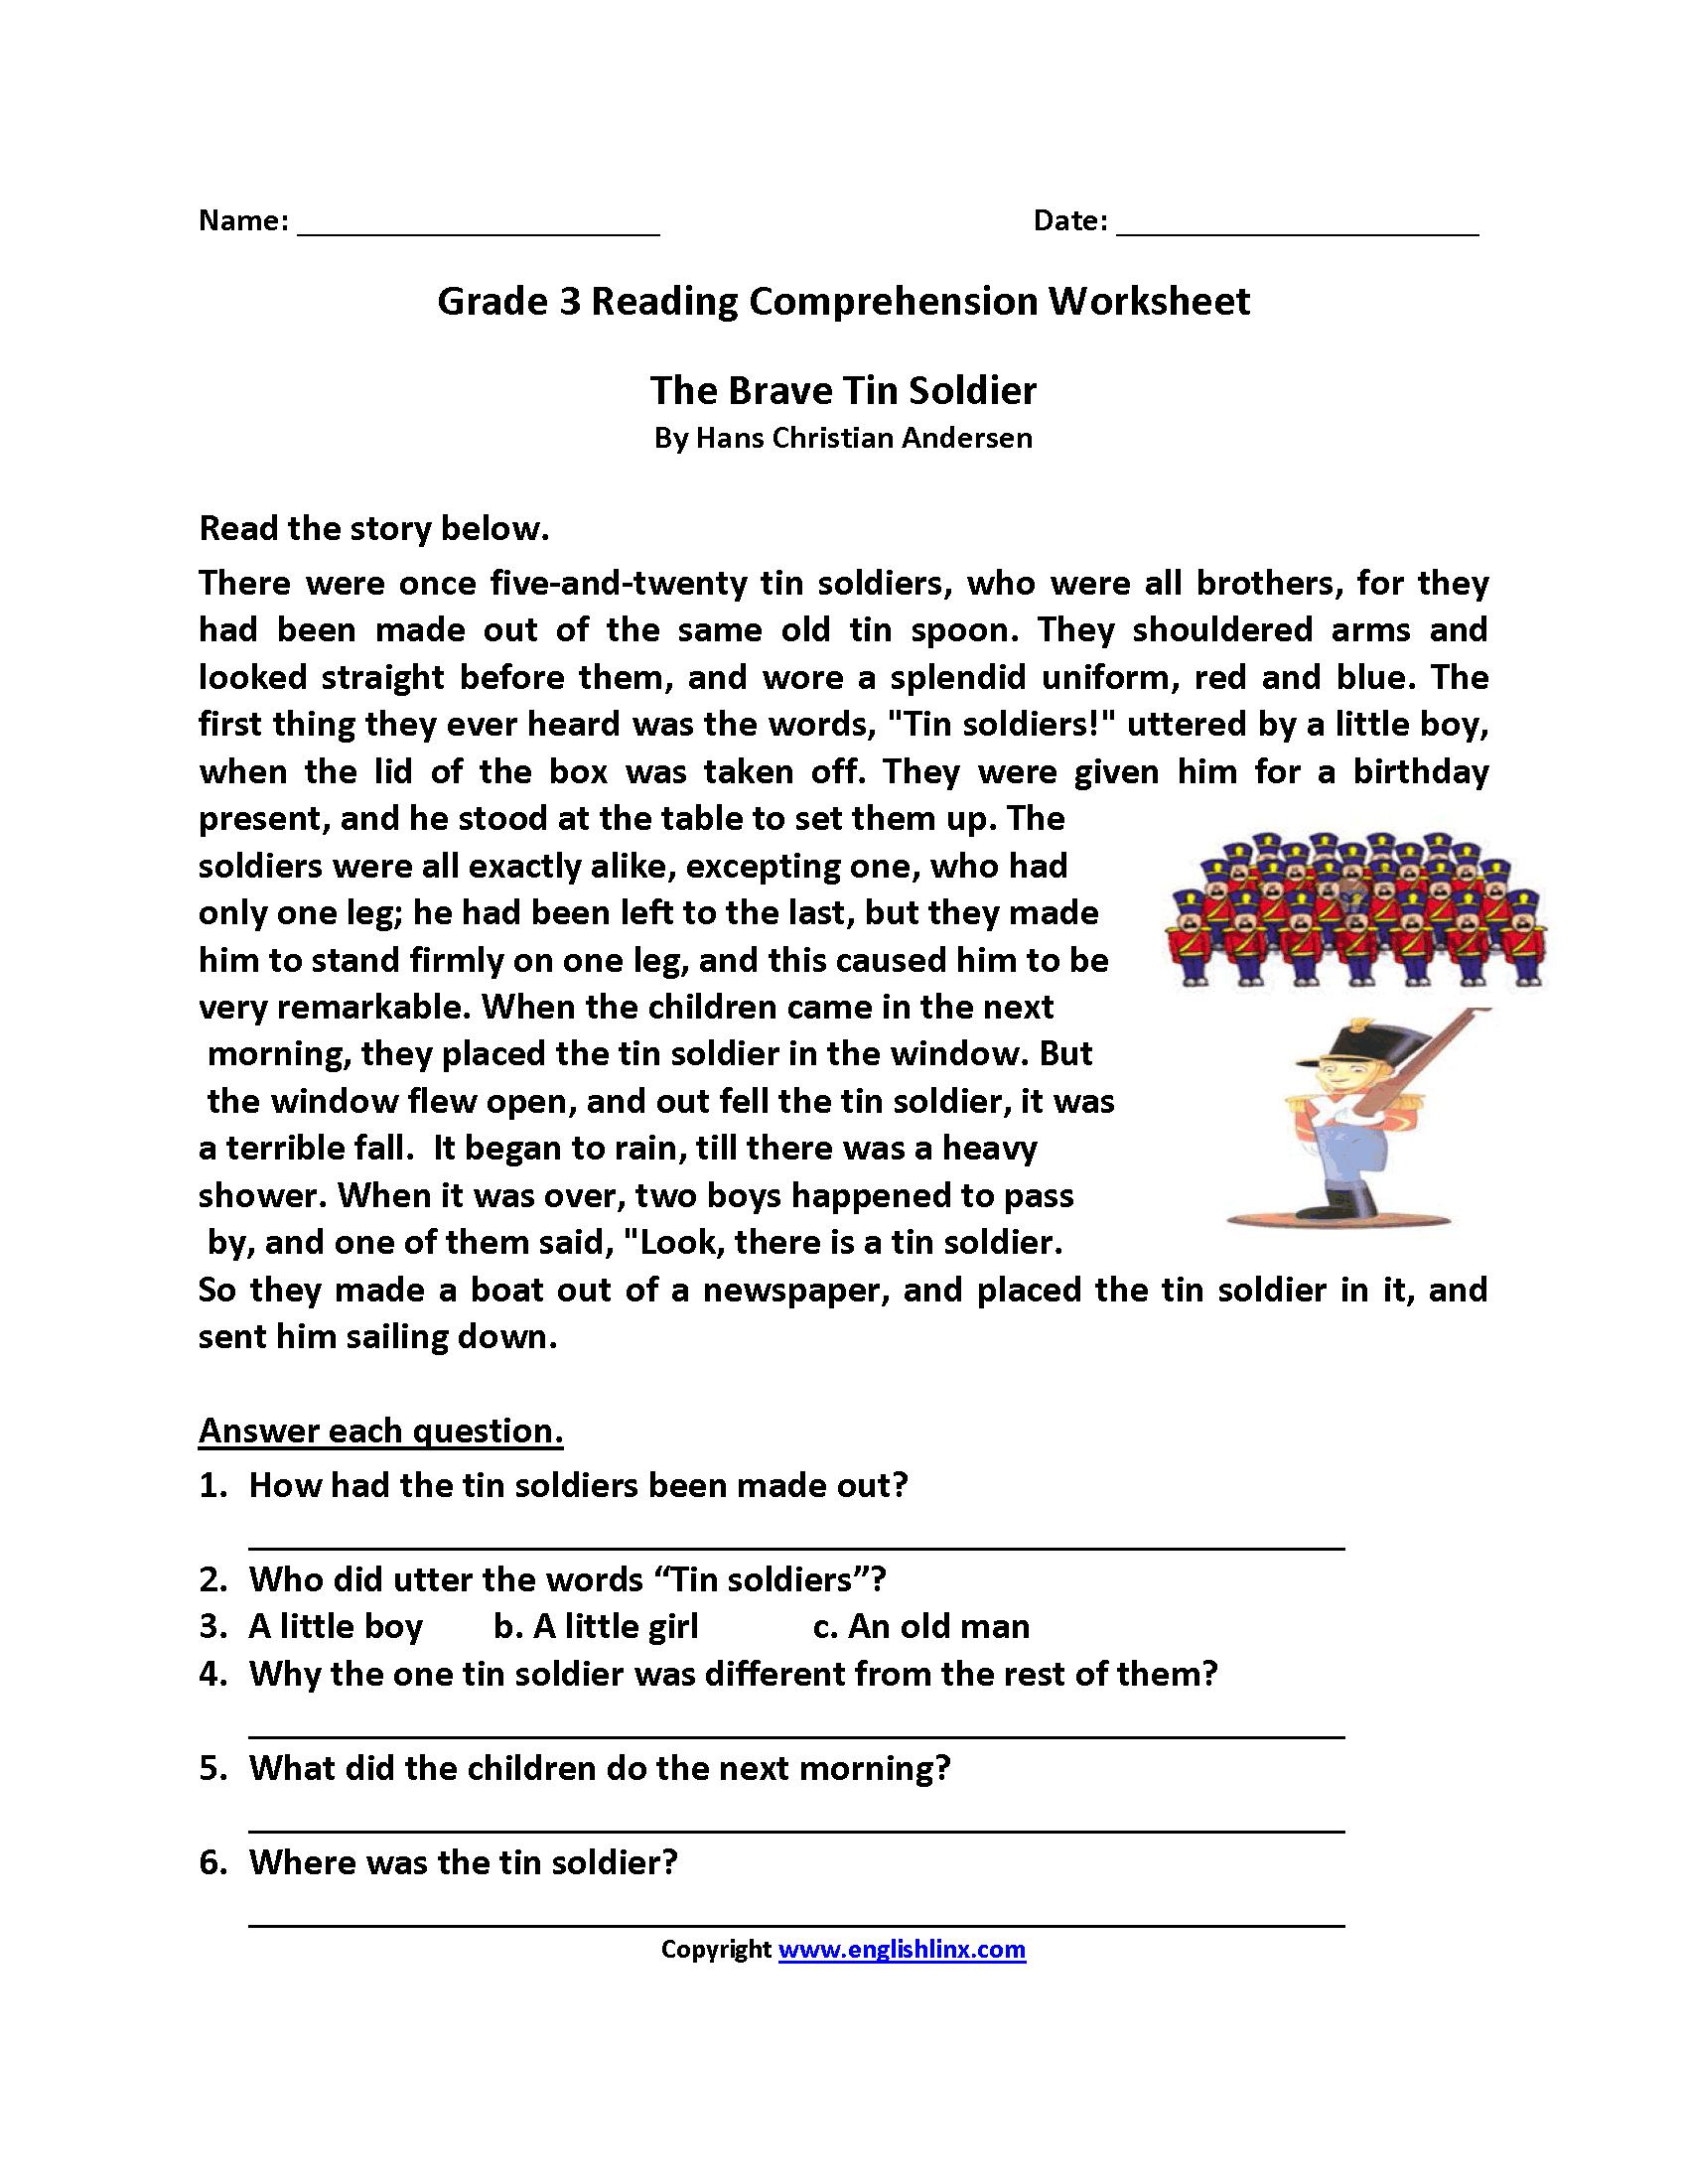 Free Printable Reading Comprehension Worksheets 3Rd Grade For Free   Free Printable 3Rd Grade Reading Worksheets